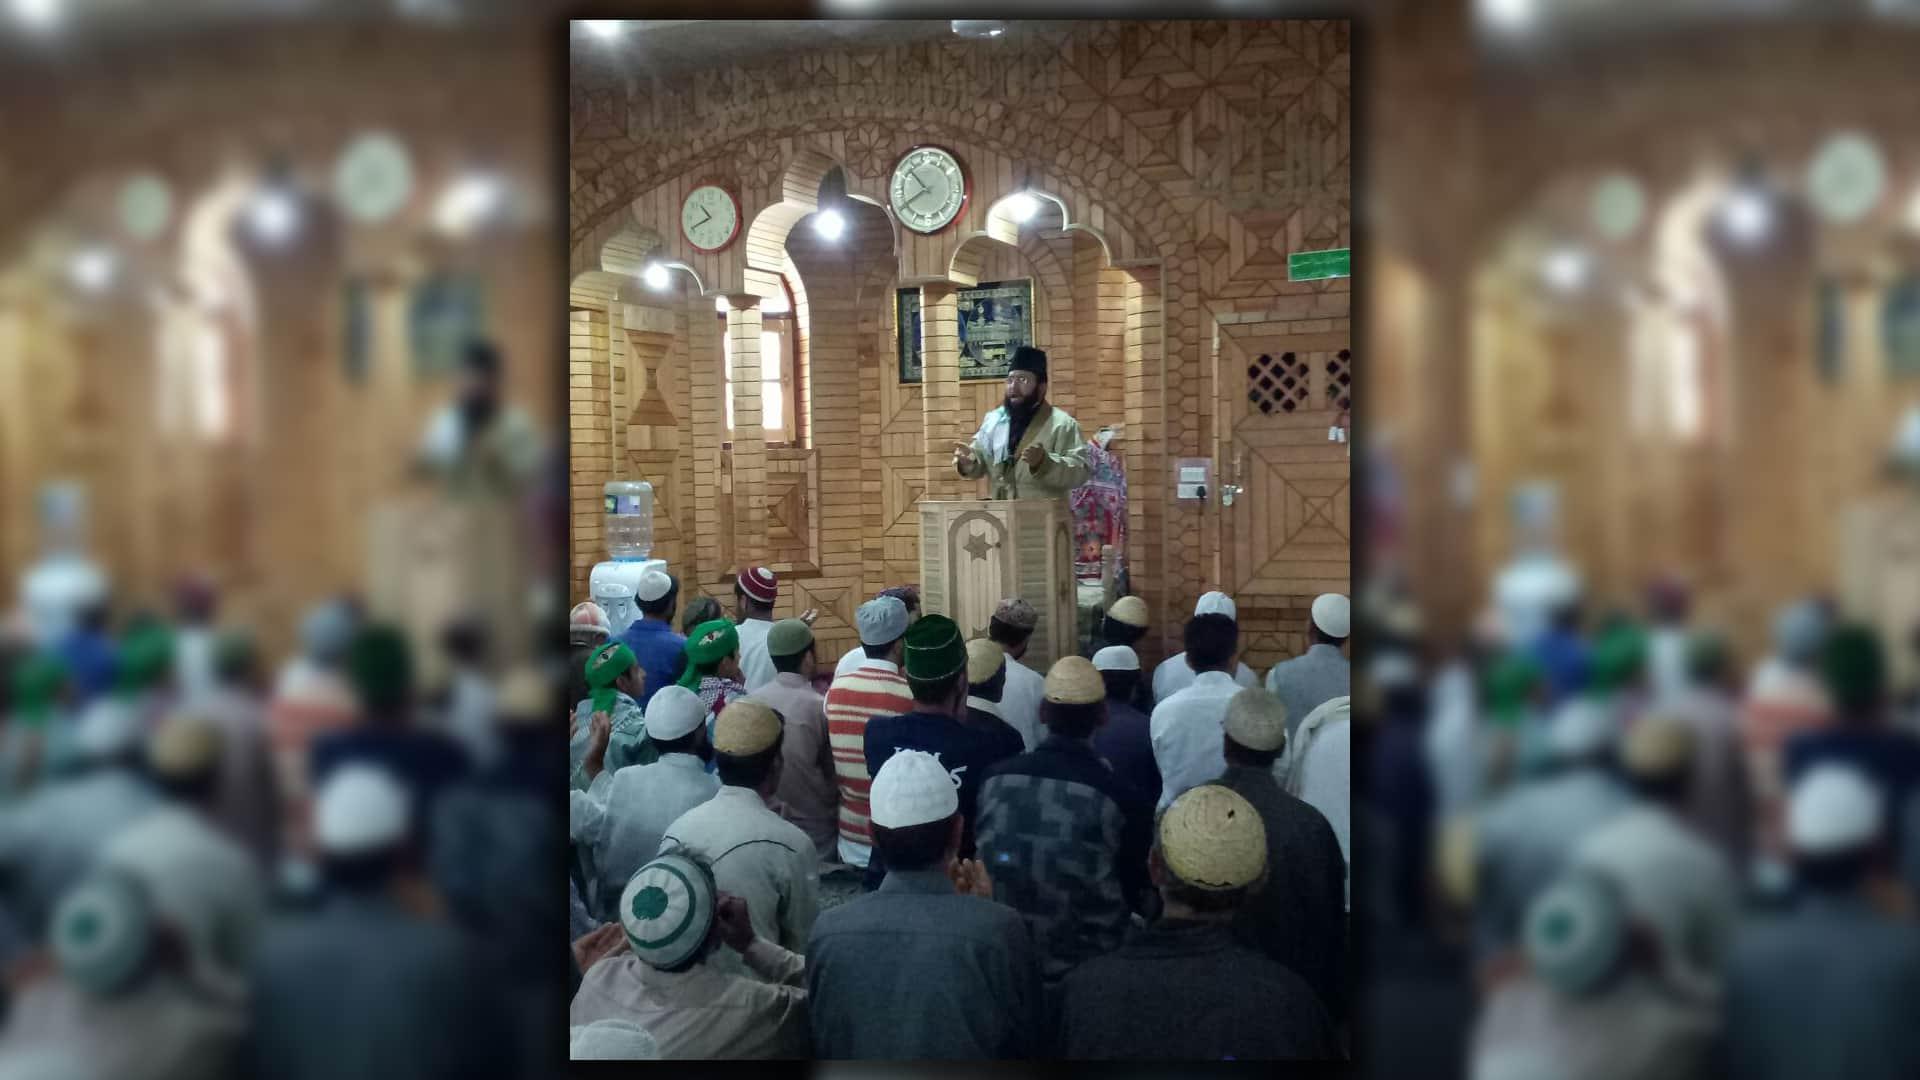 Kashmir imam terrorism violence drugs corruption youth Awami forum